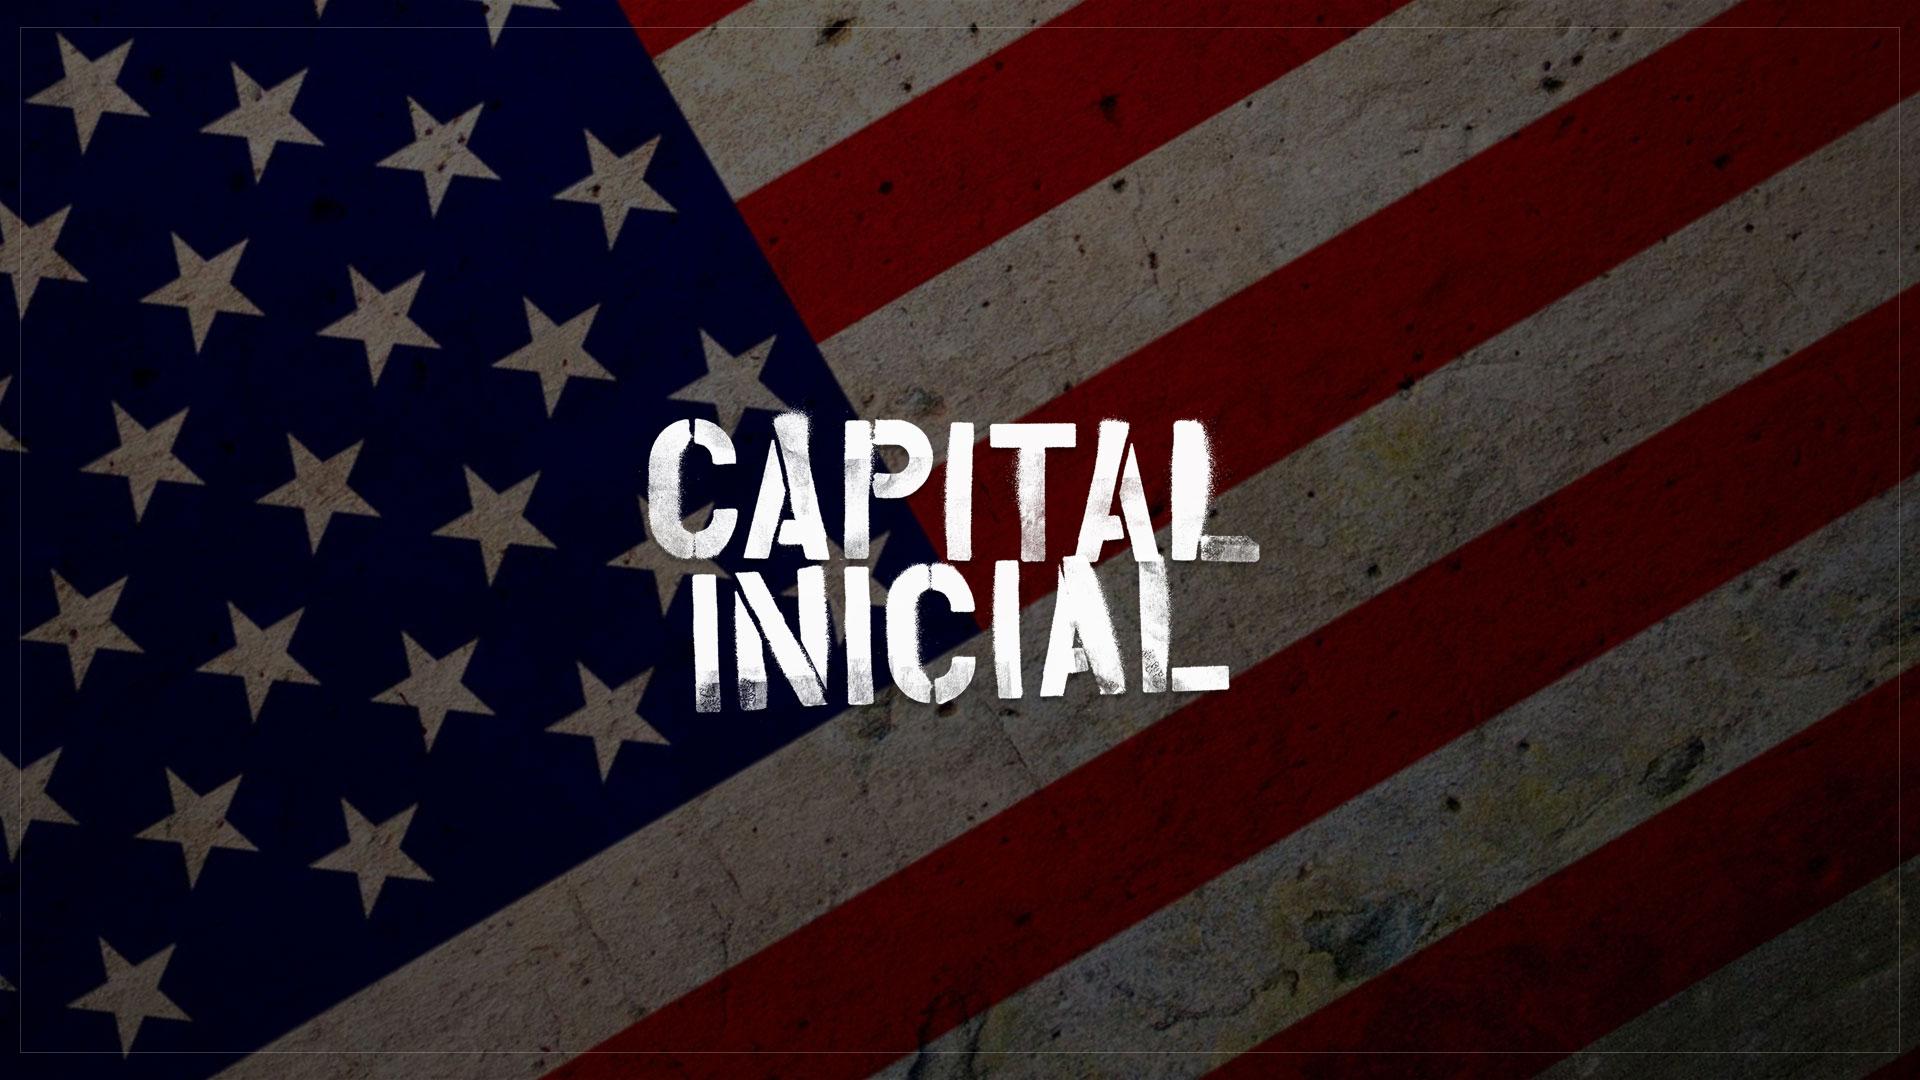 Capital Inicial nos Estados Unidos